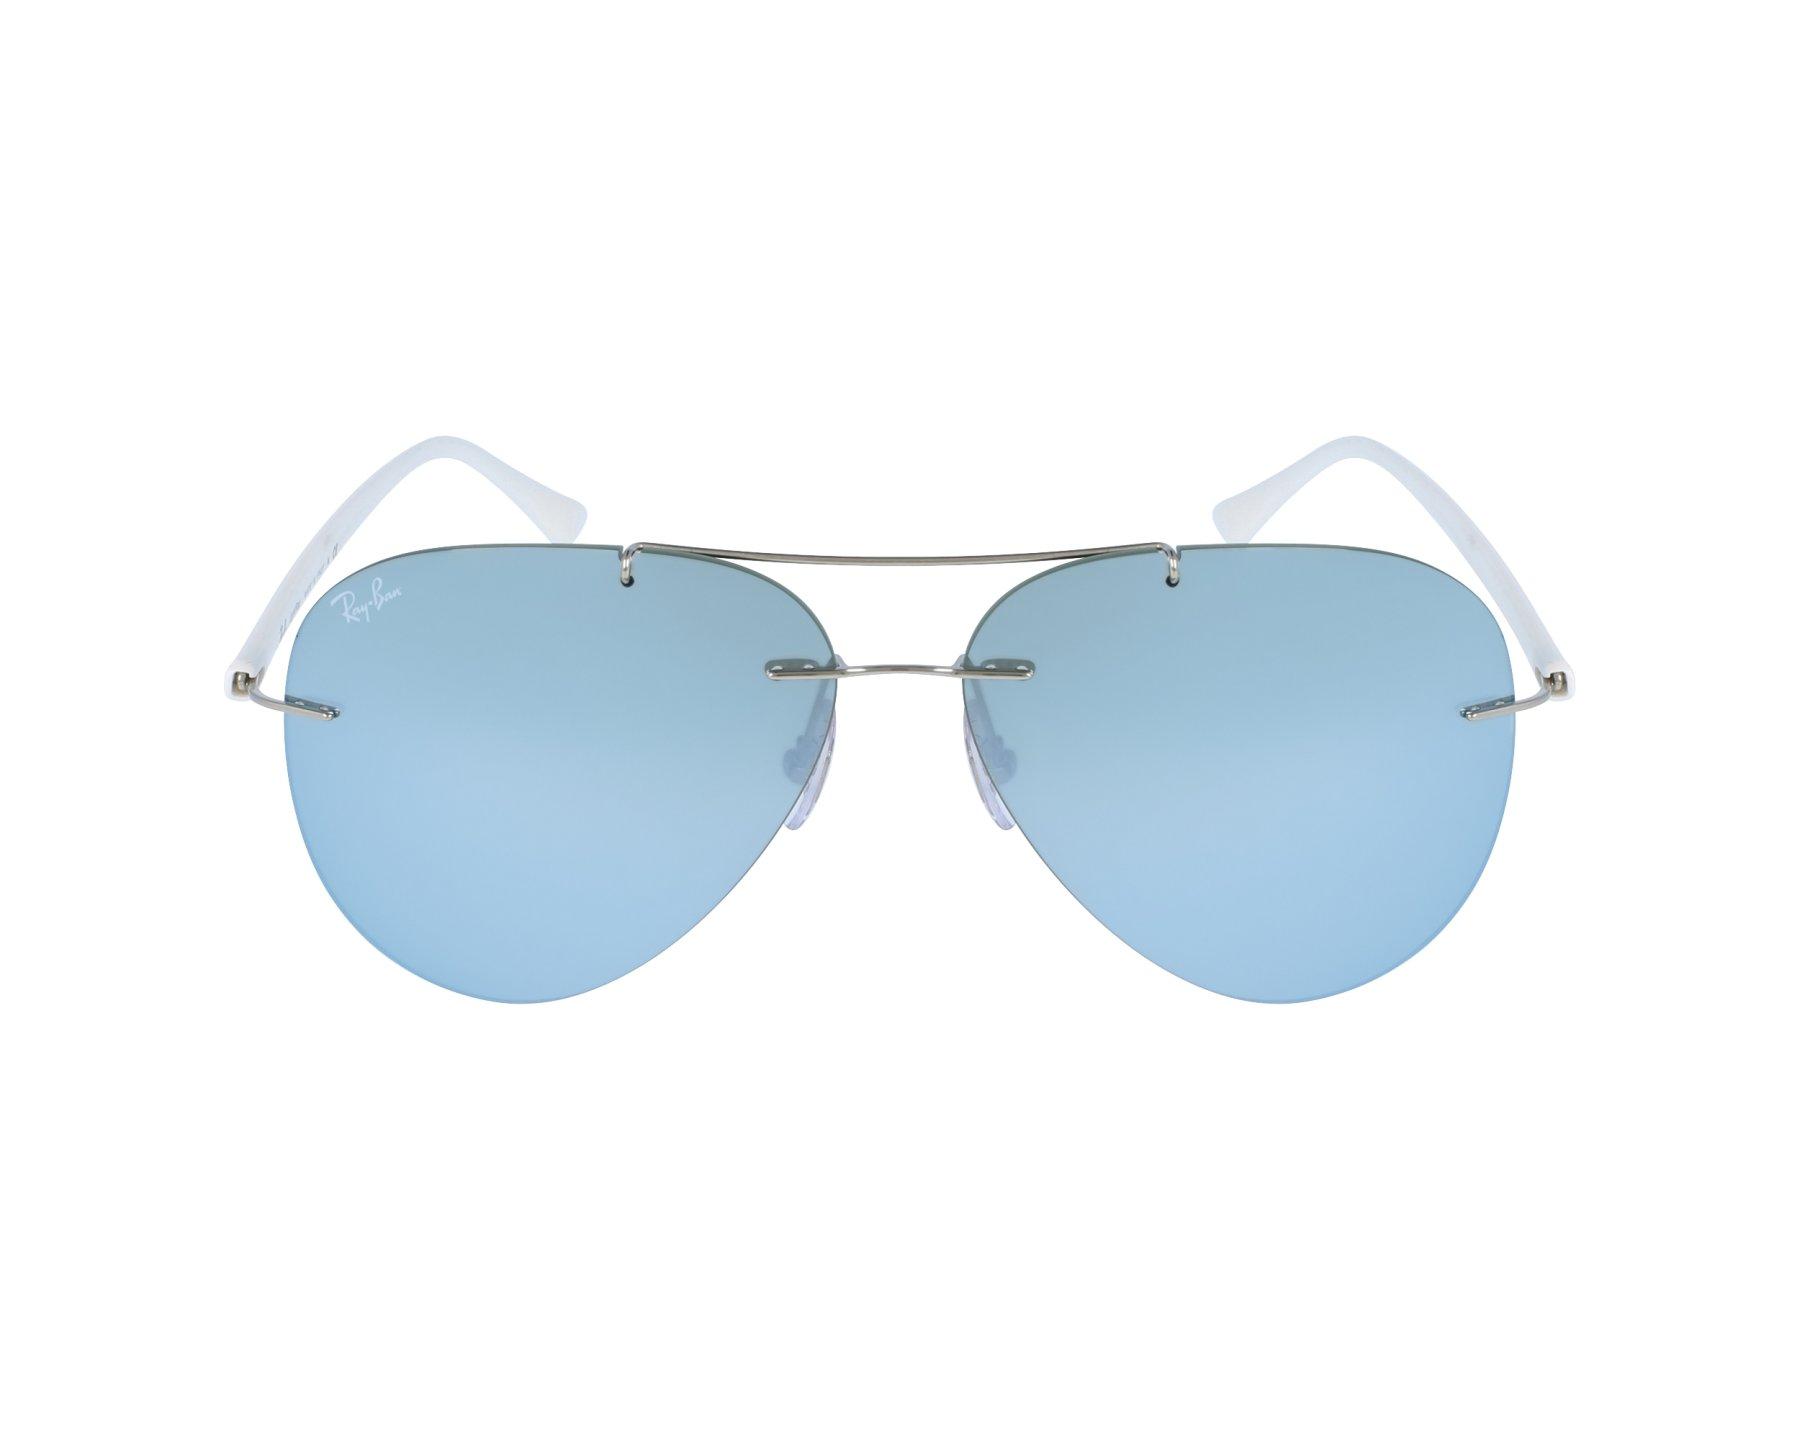 d17c467a6e Gafas de sol Ray-Ban RB-8058 003/30 - Plata Blanco vista